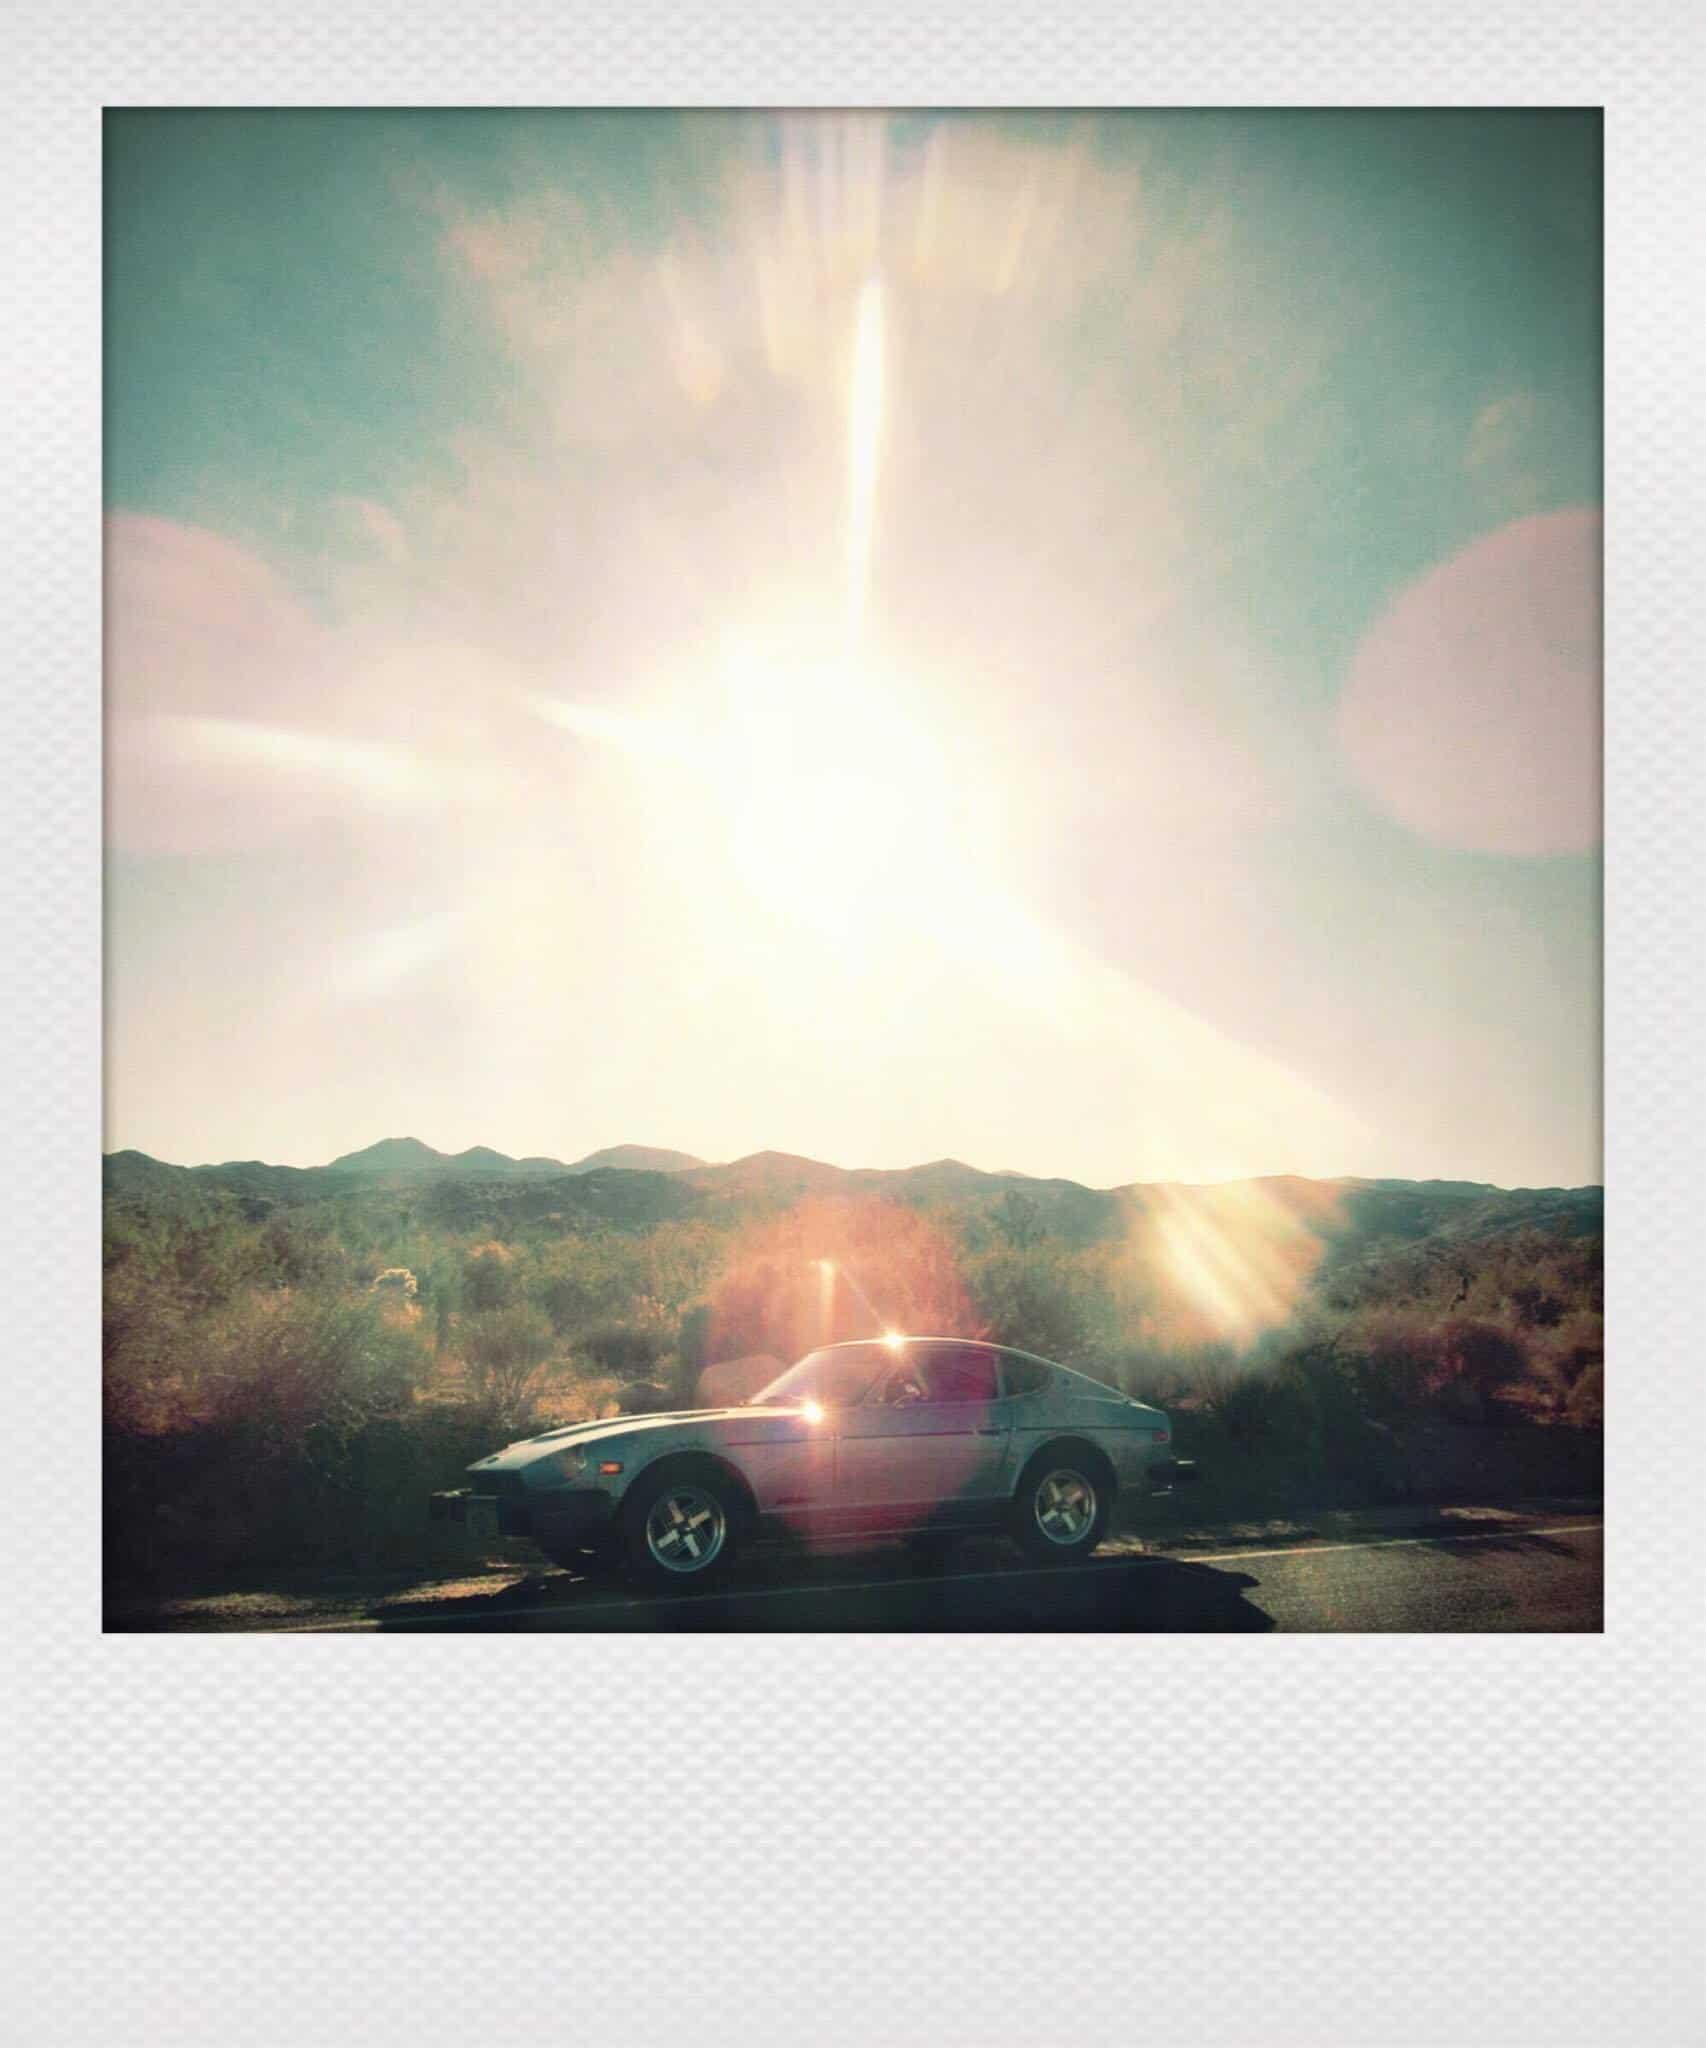 Datsun 280Z polaroid